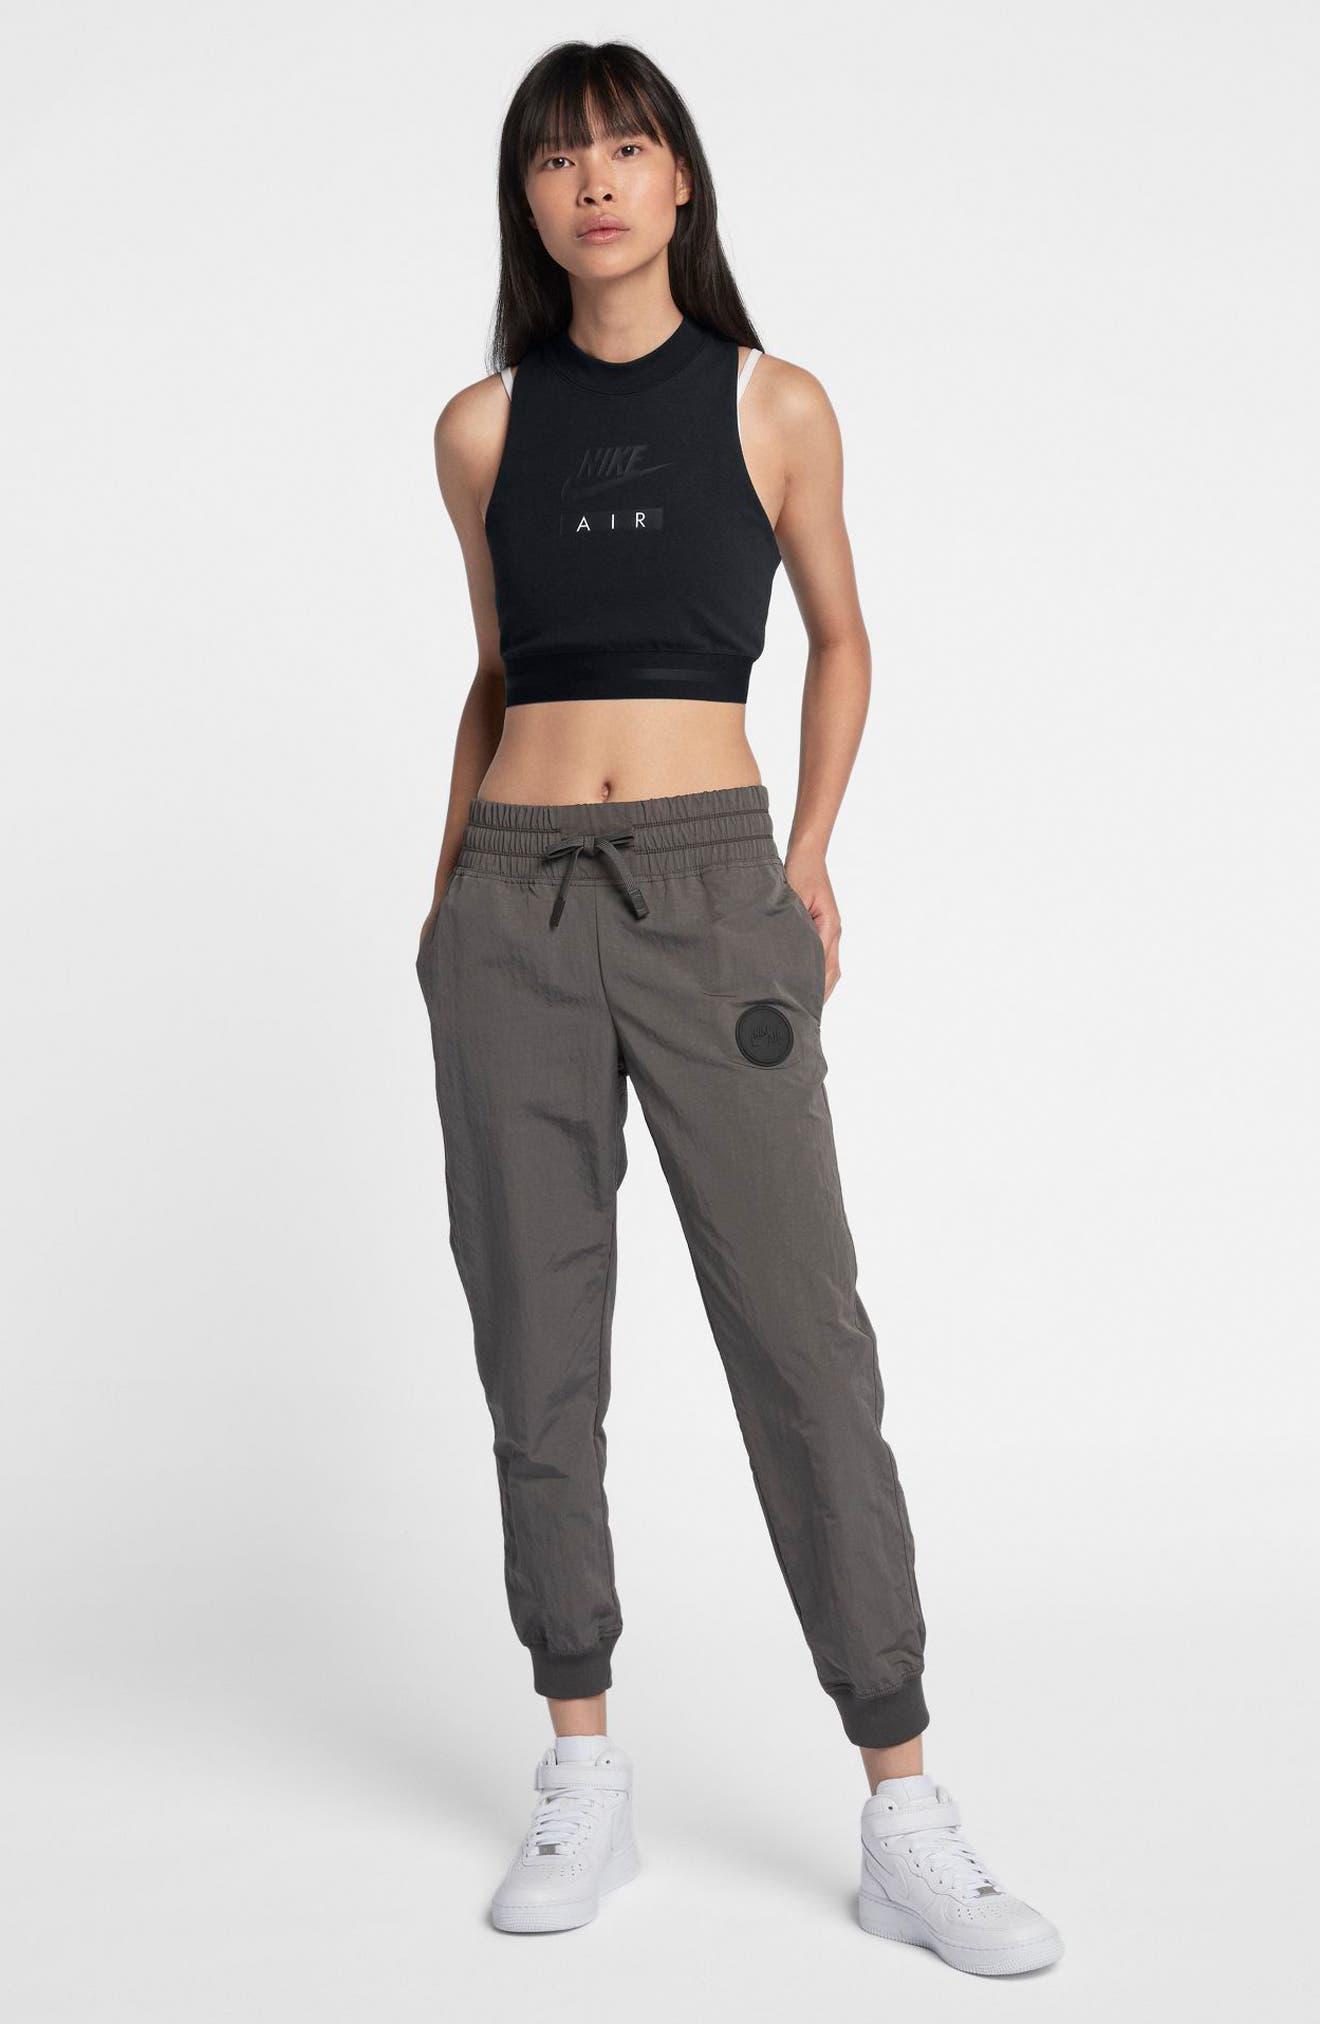 Sportswear Air Women's Crop Top,                             Alternate thumbnail 4, color,                             Black/ Black/ Black